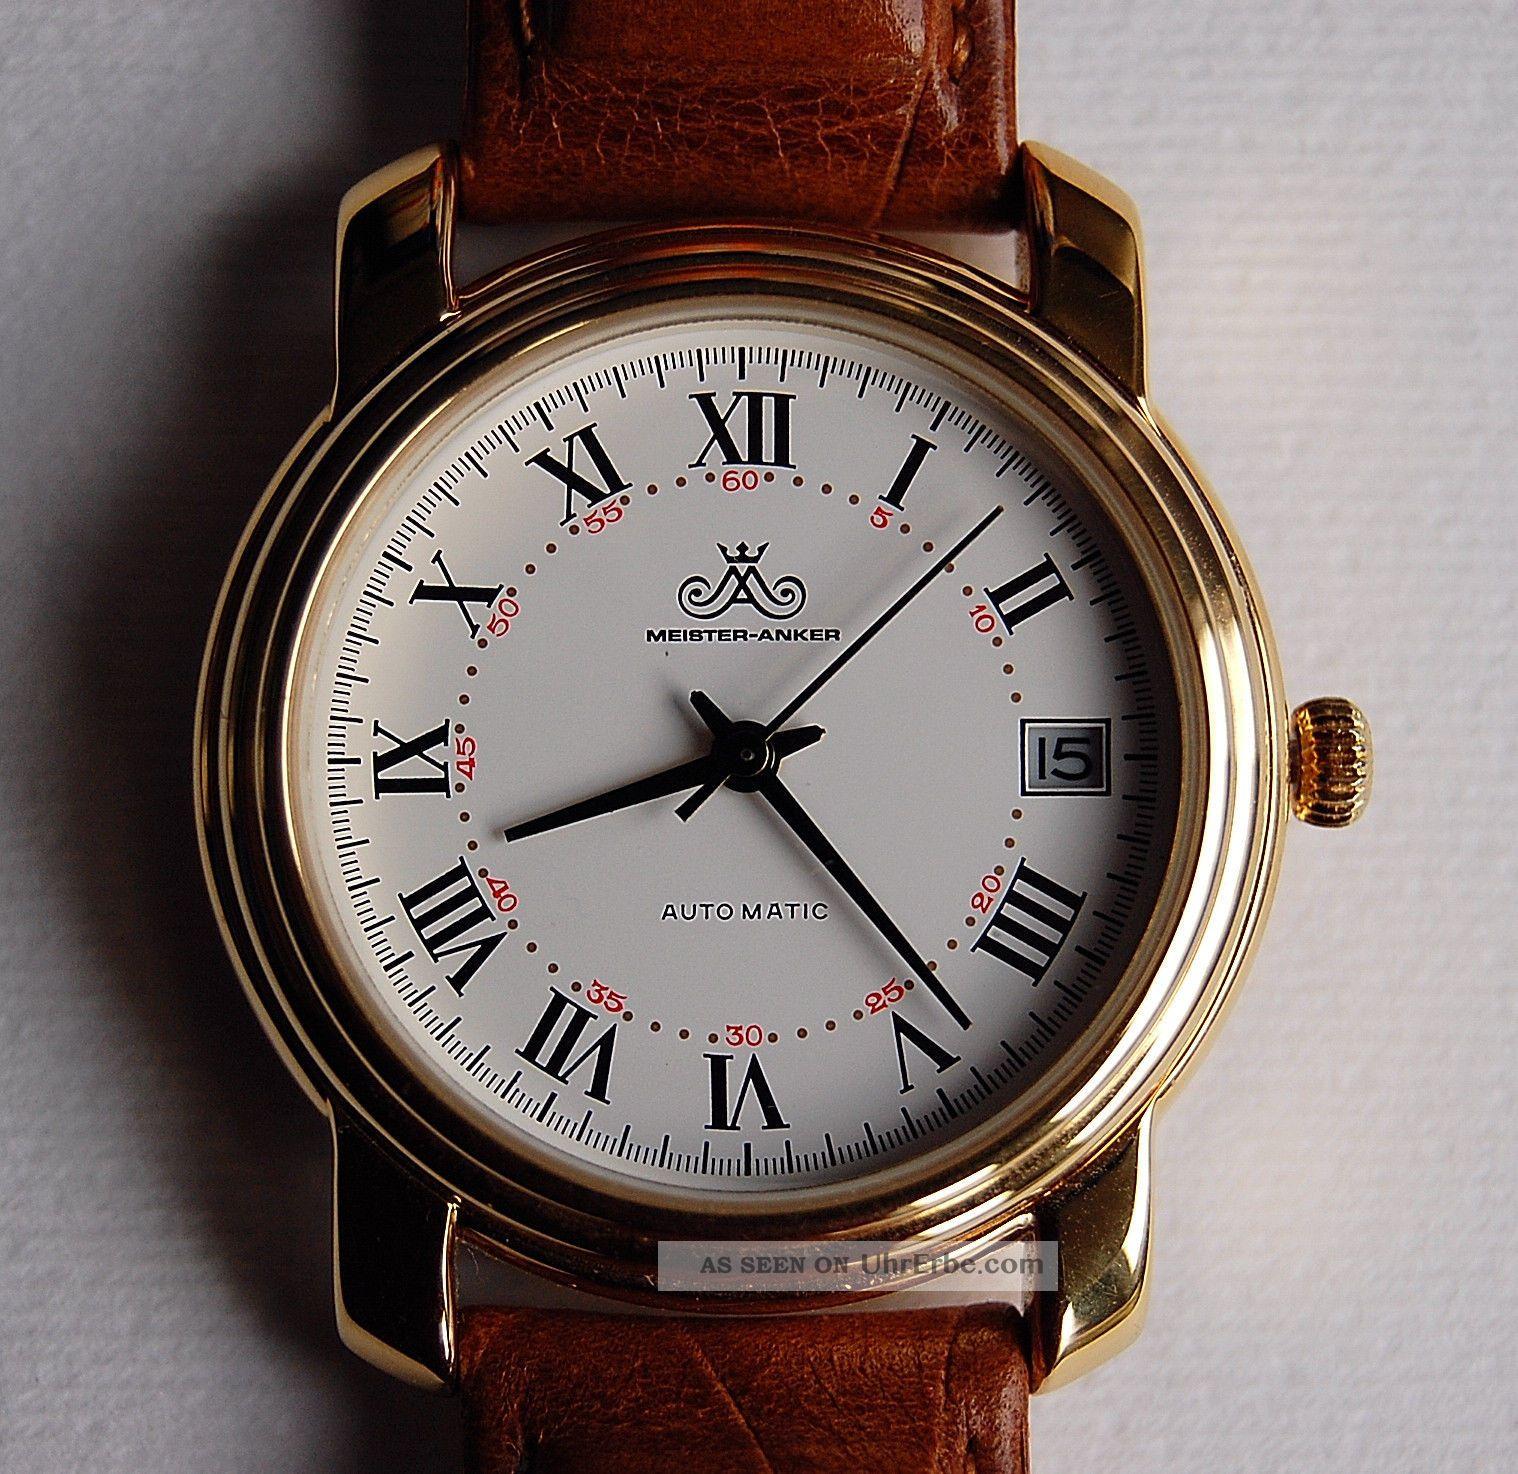 Meister - Anker Miyota 8205 Automatik Datum Analog 80er Hau Römische Ziffer Wi Armbanduhren Bild